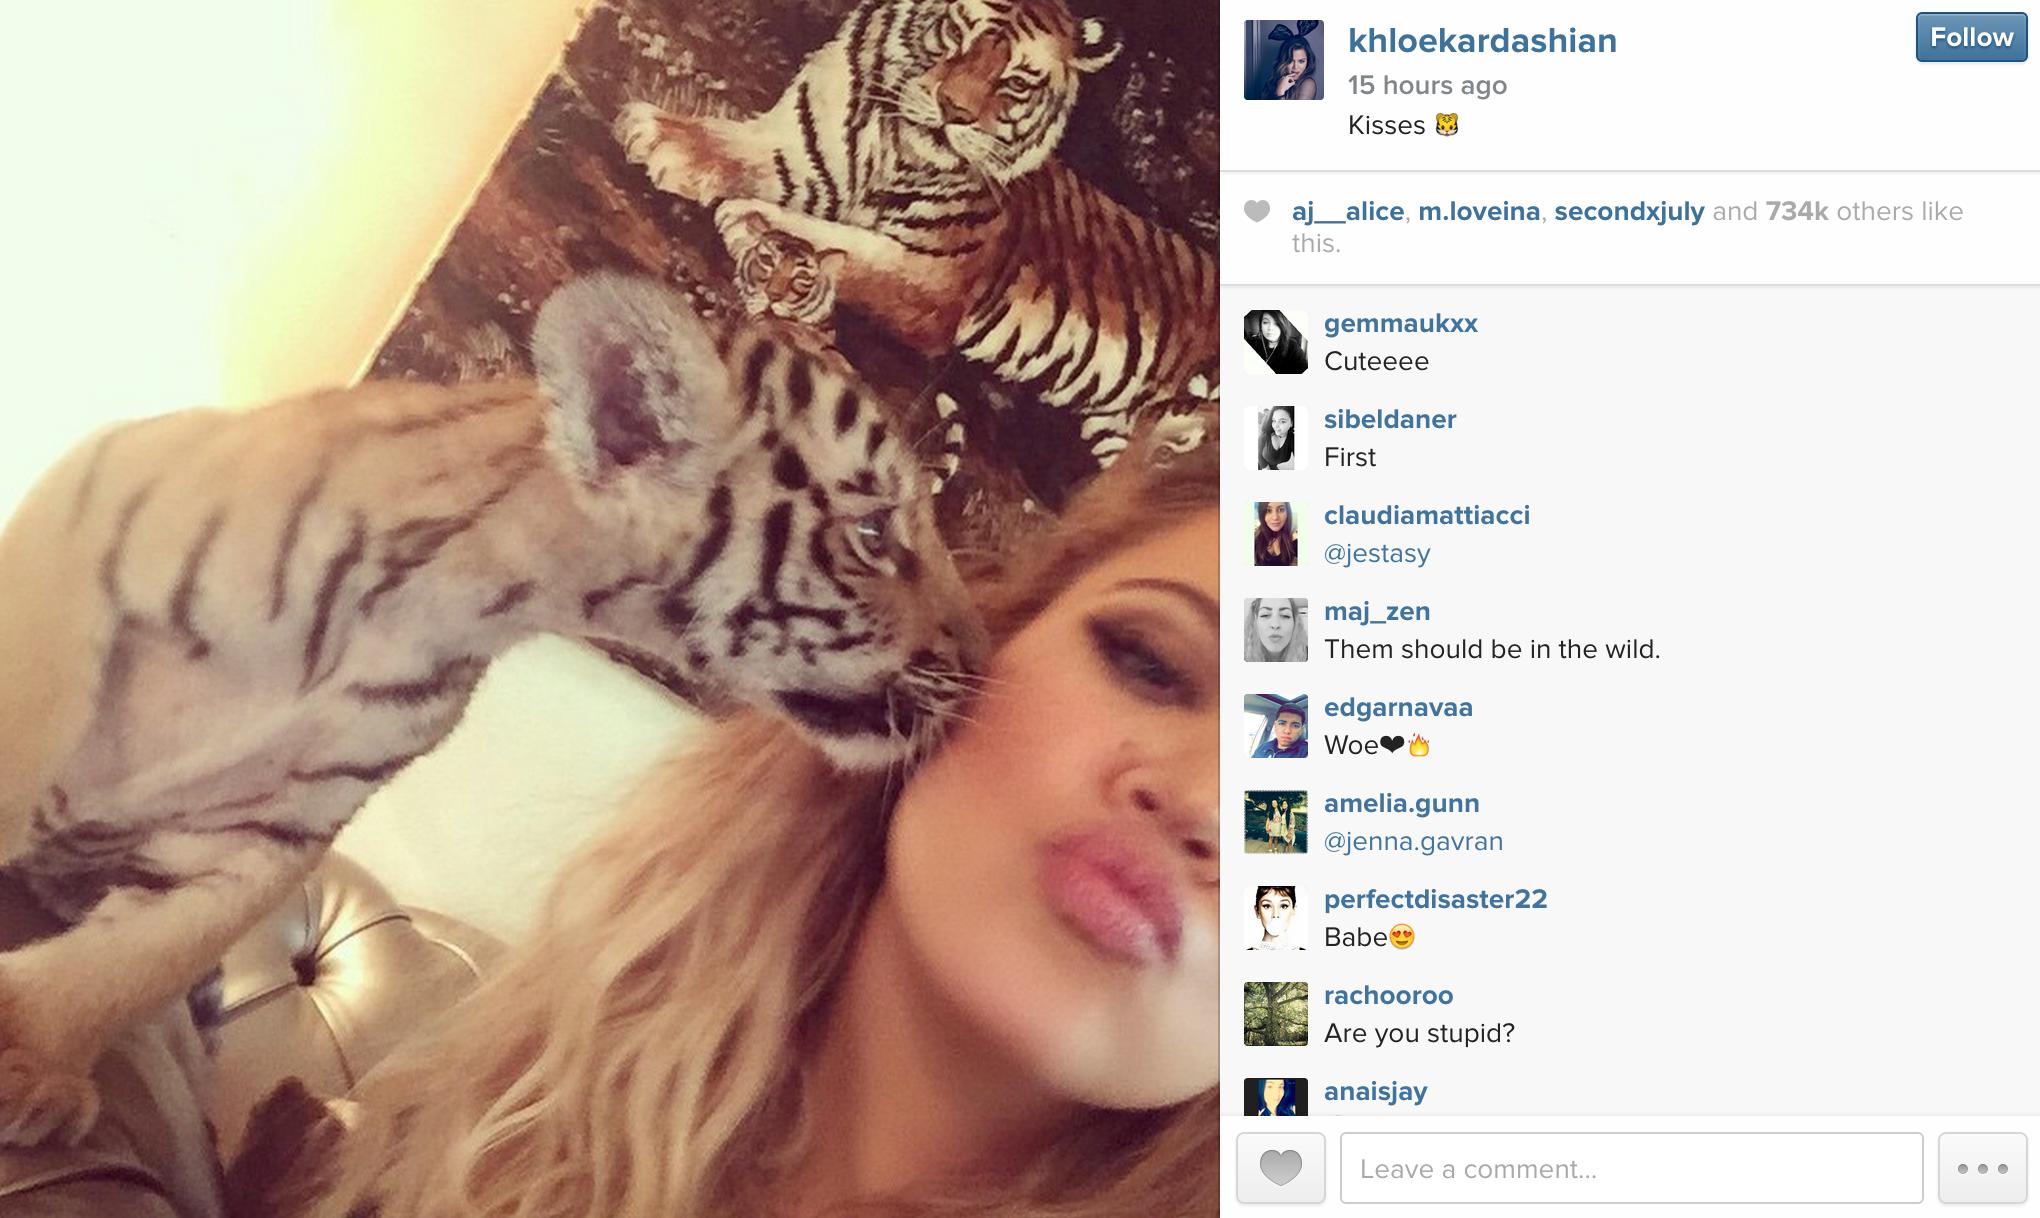 Animal rights activists roar with anger over Khloe Kardashian's Dubai tiger selfie!